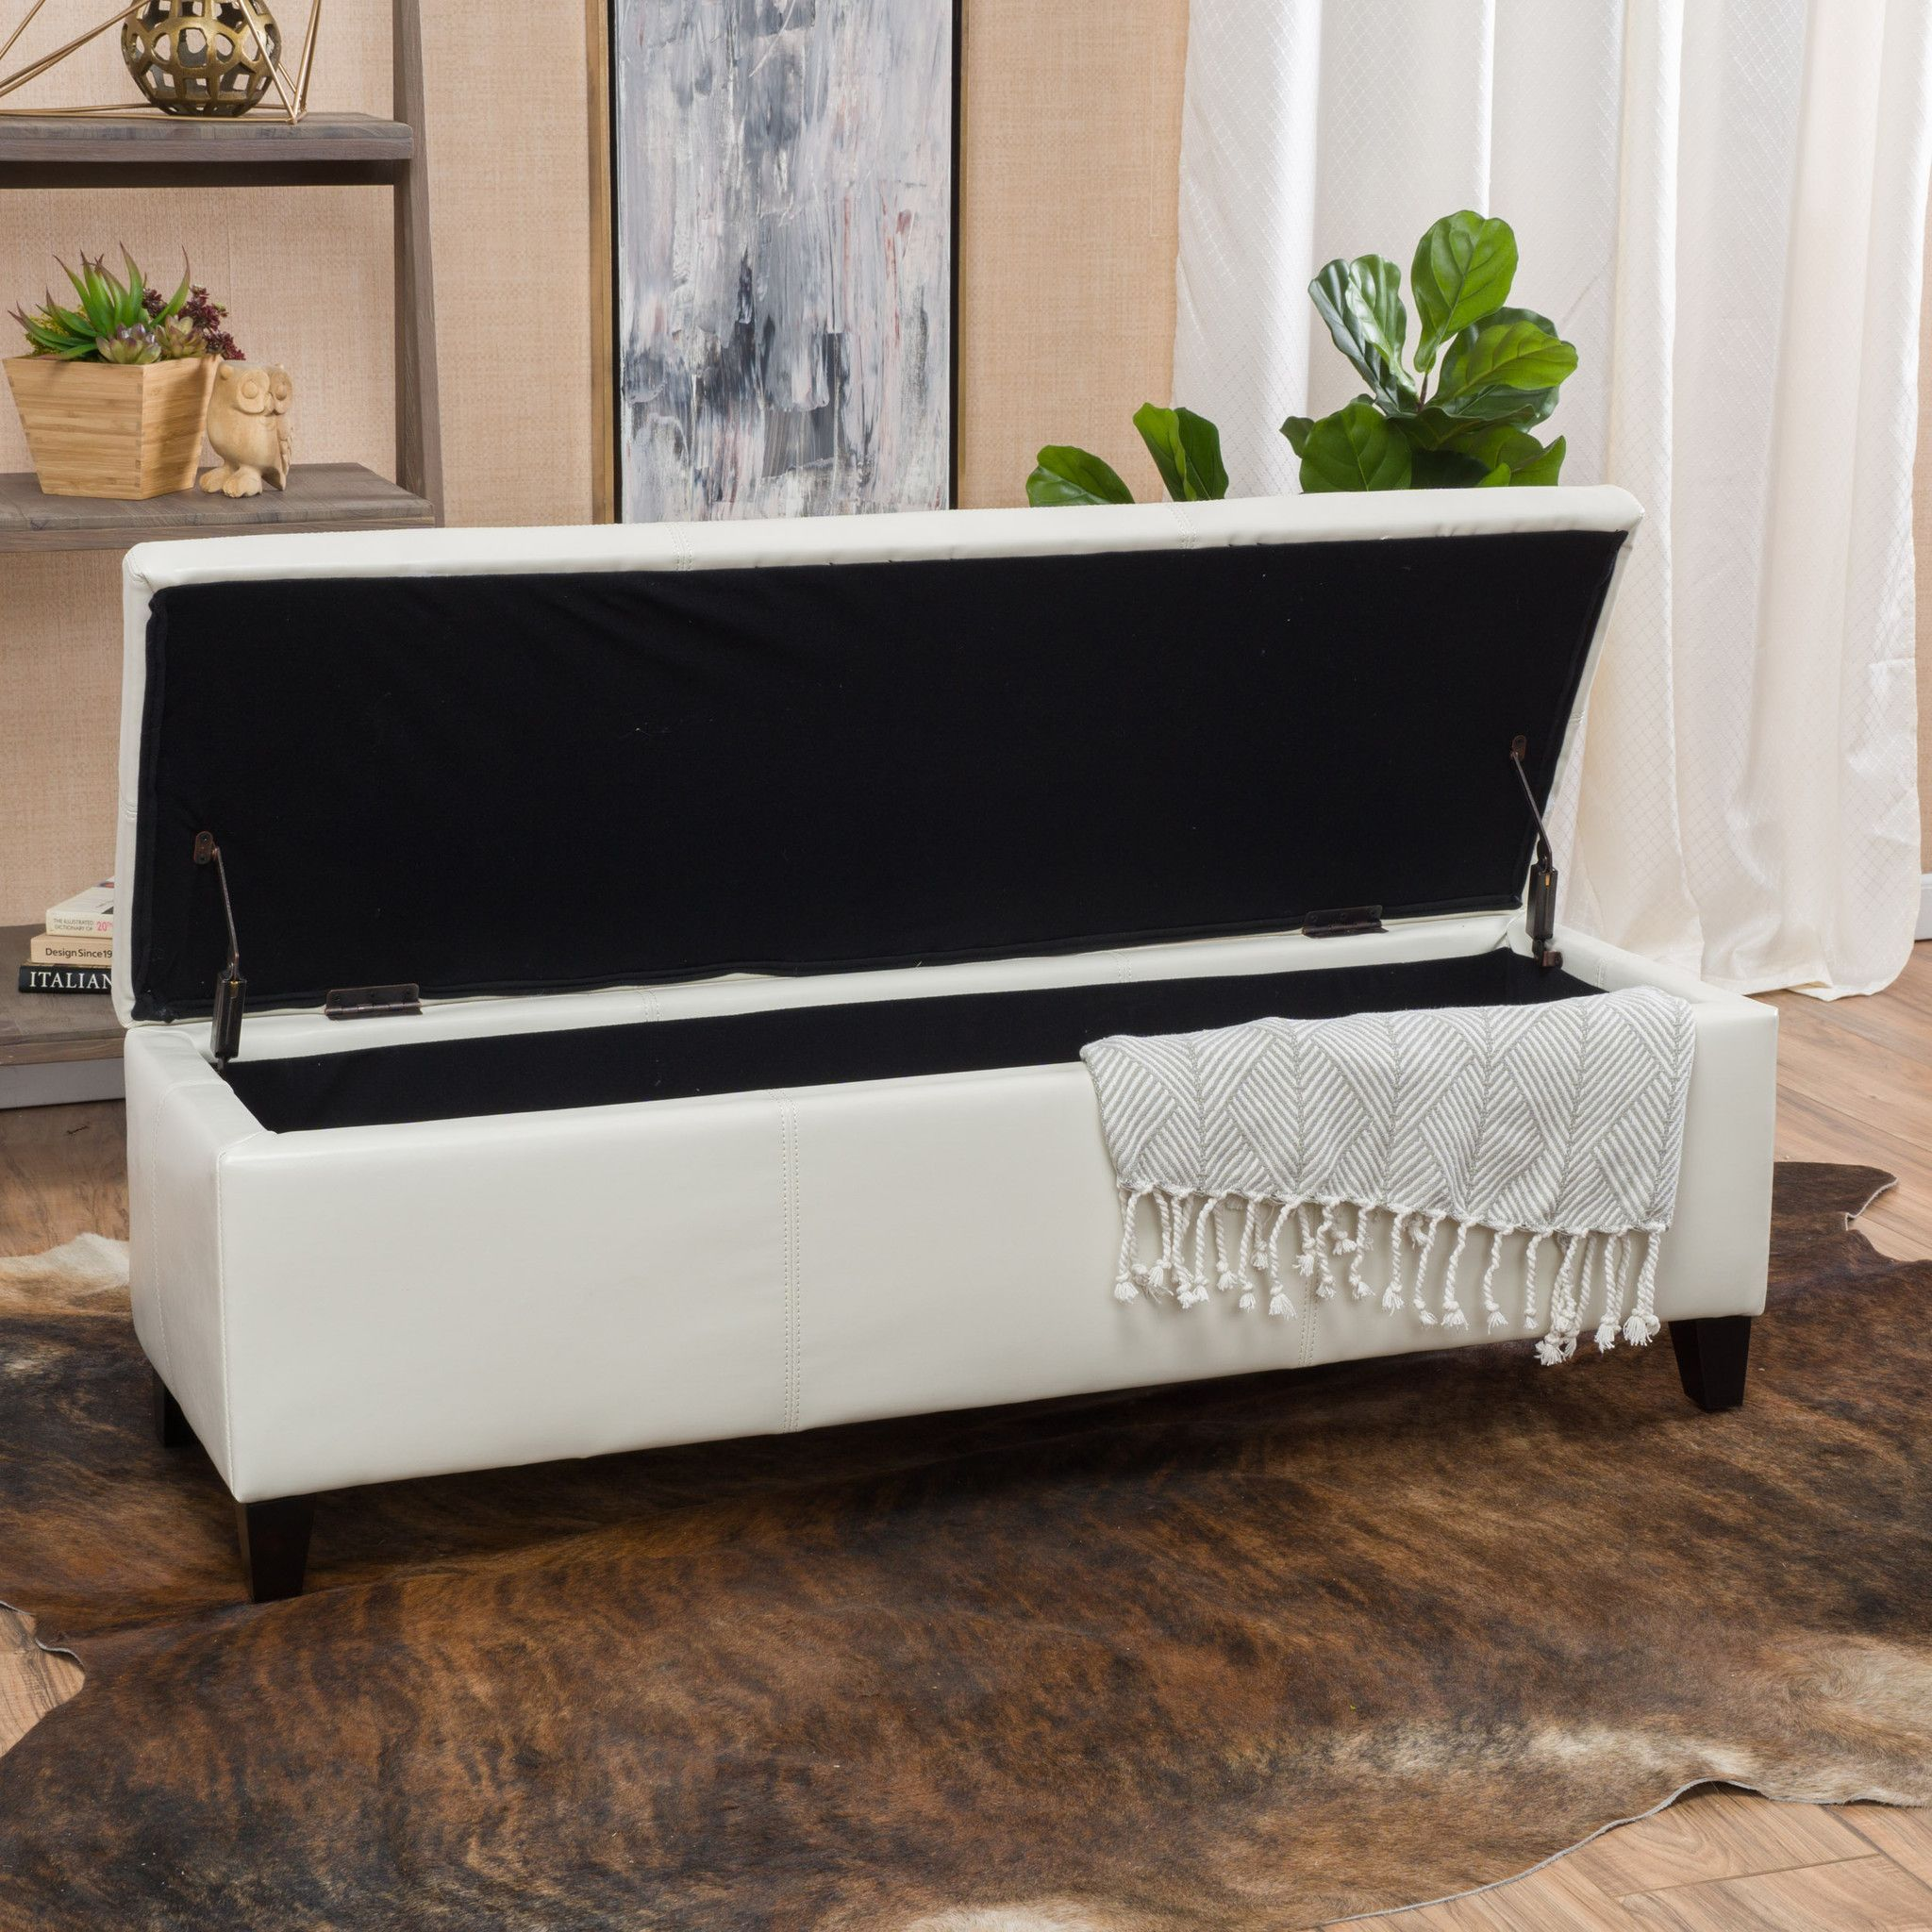 Skyler Off-White Leather Storage Ottoman Bench   Decoraciones de ...